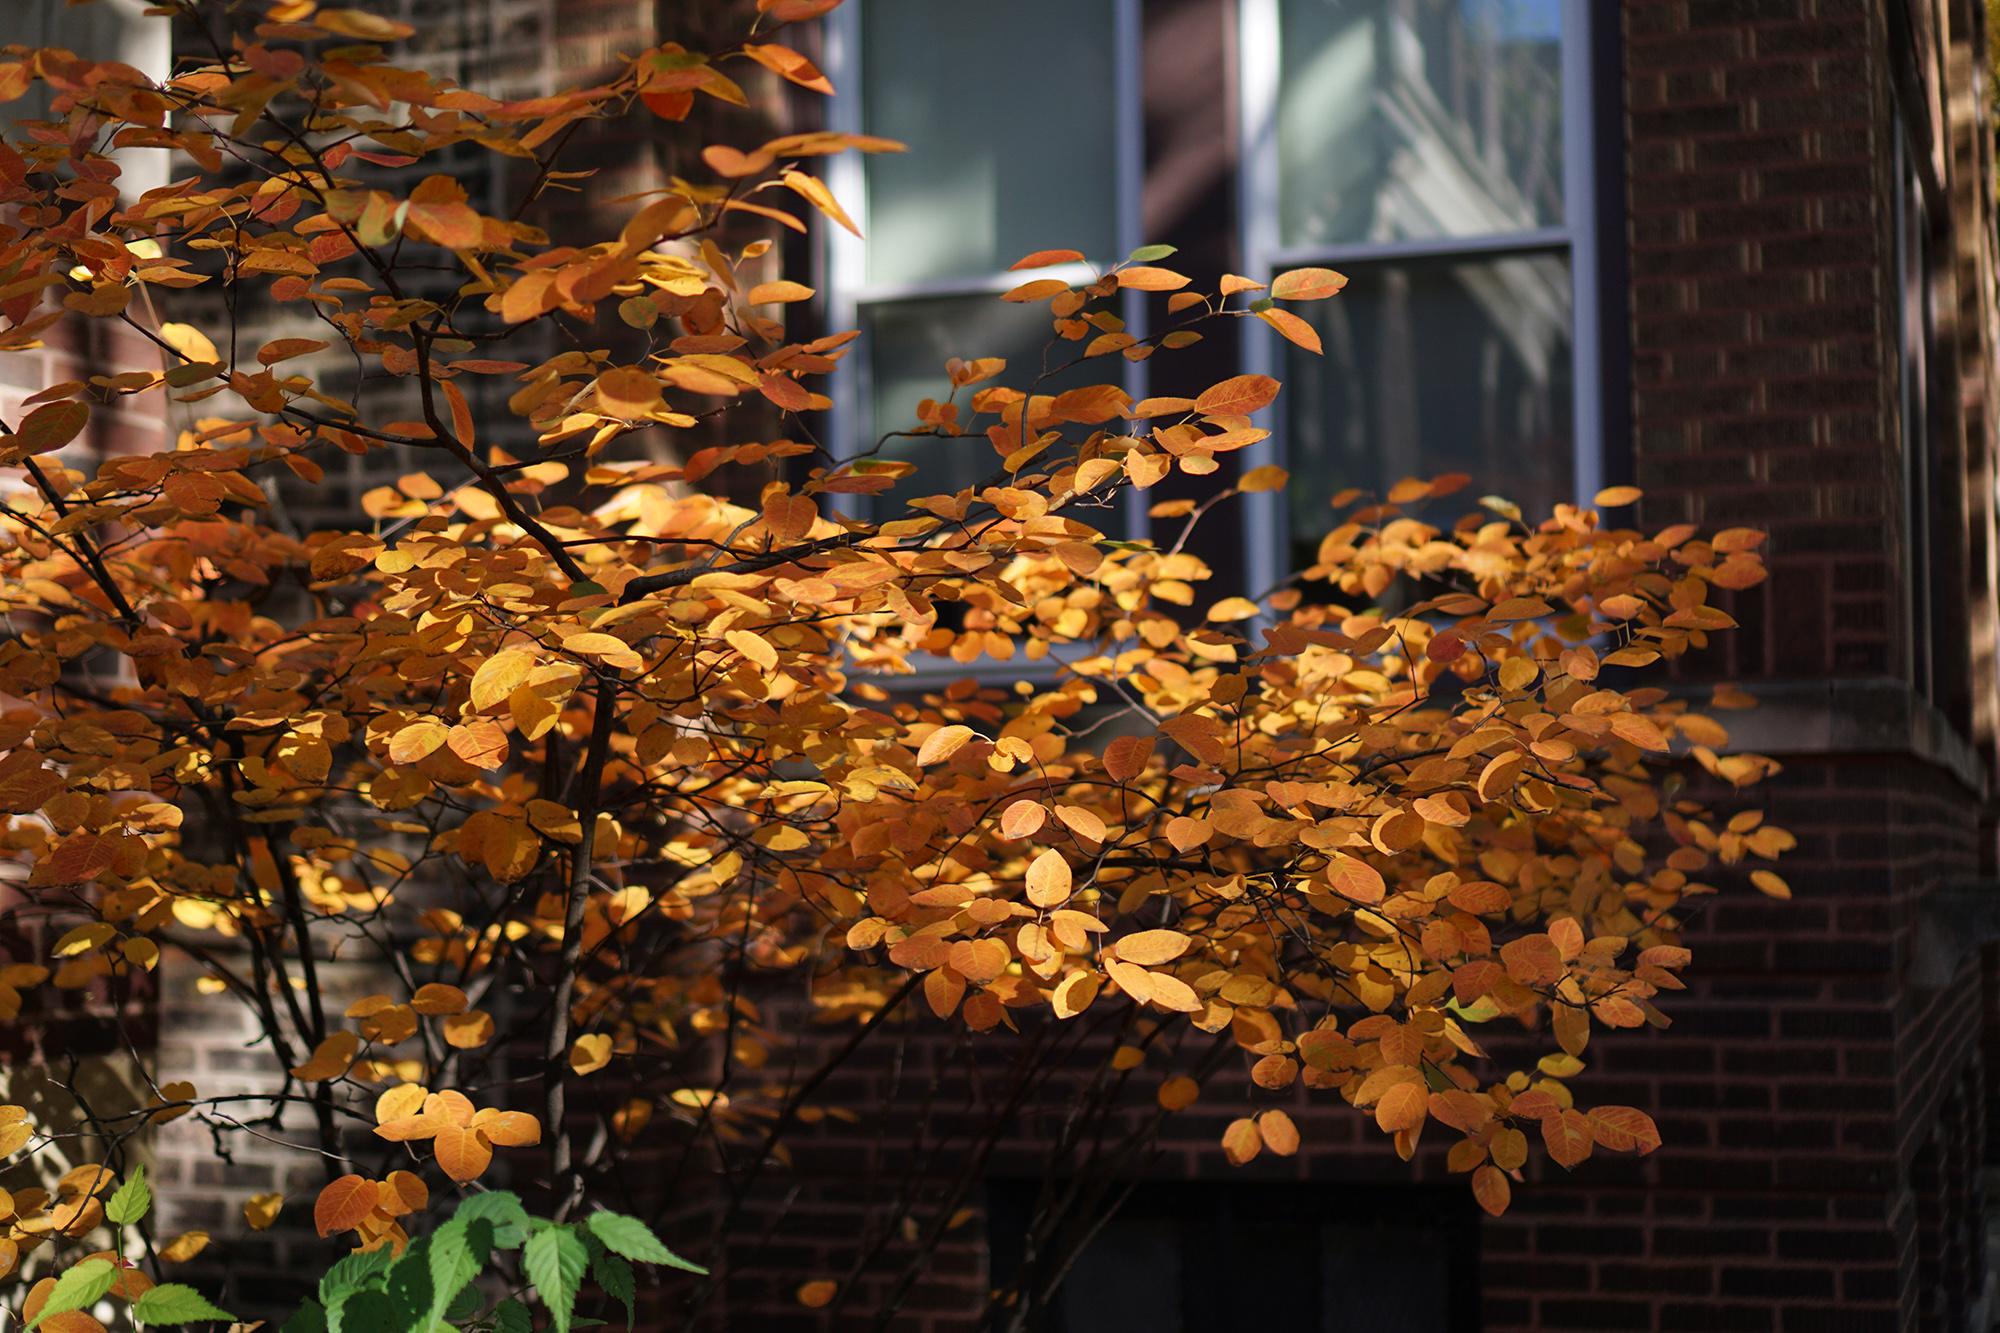 Serviceberry tree in autumn, Chicago IL / Darker than Green